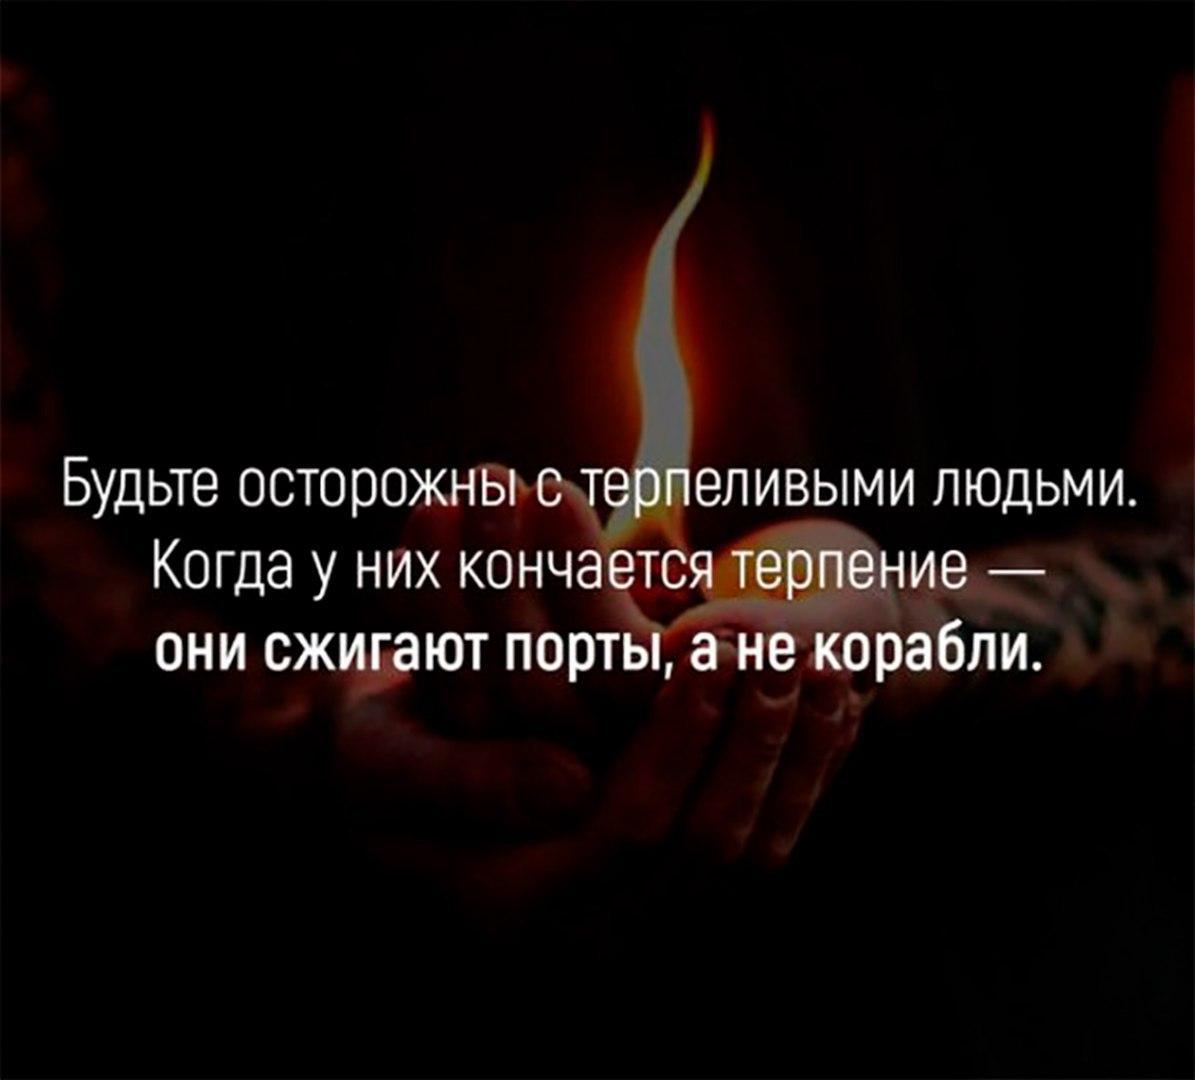 https://pp.userapi.com/c840132/v840132202/5cac8/z4WMjYy3_Os.jpg